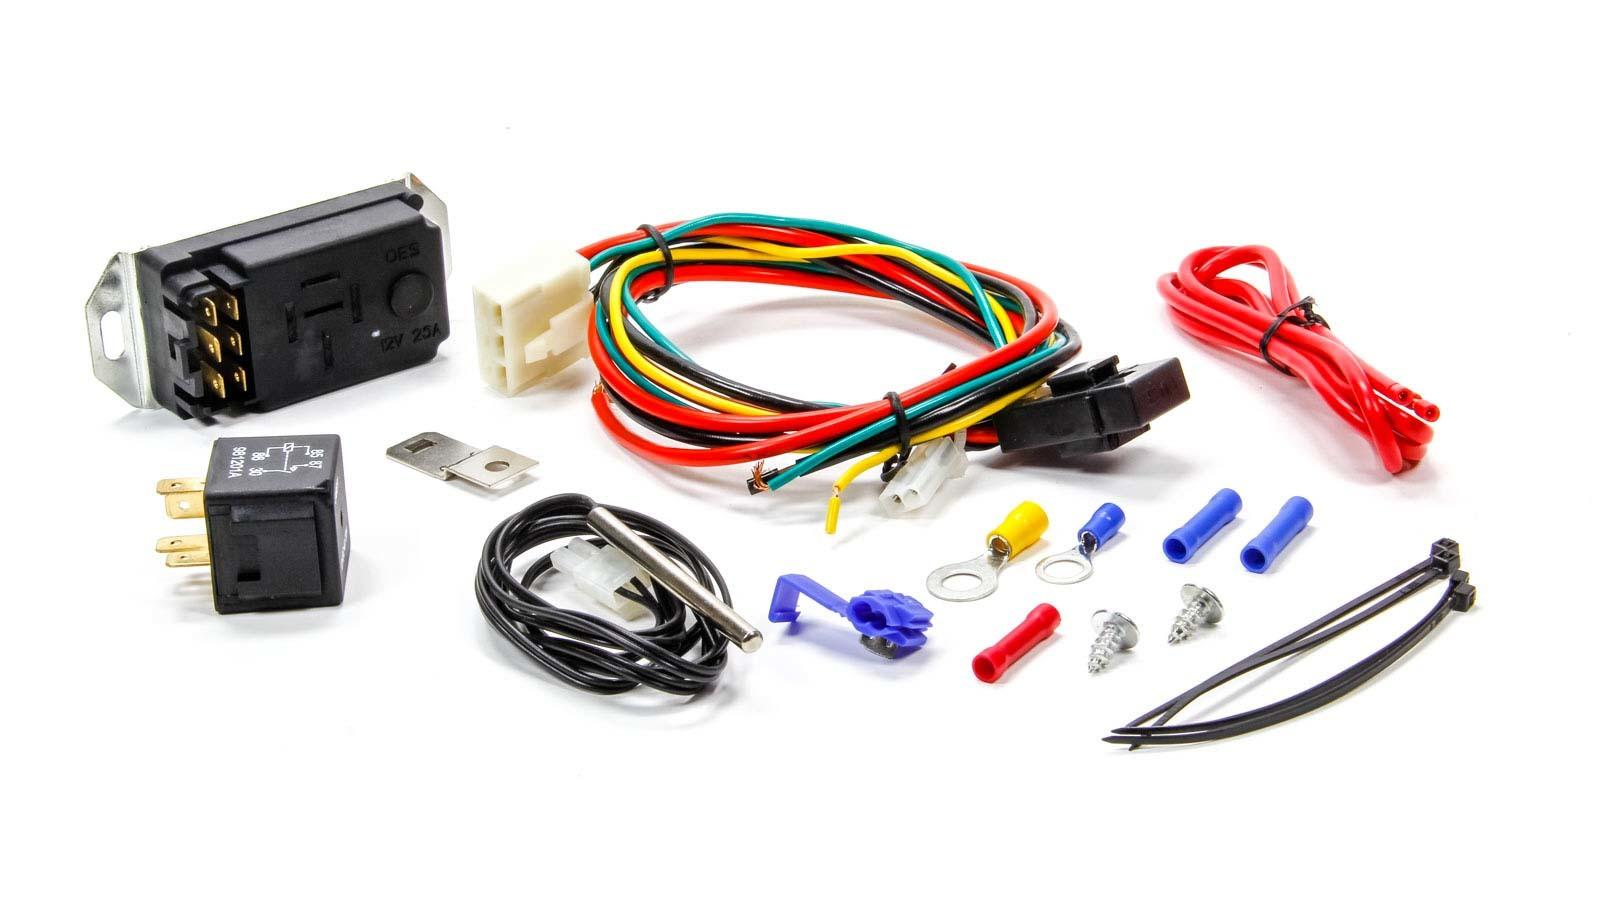 Proform 69599 Fan Controller, Adjustable, 150-240 Degree F Activation Range, Push-In Probe Sensor, 30 amp Relay, Each